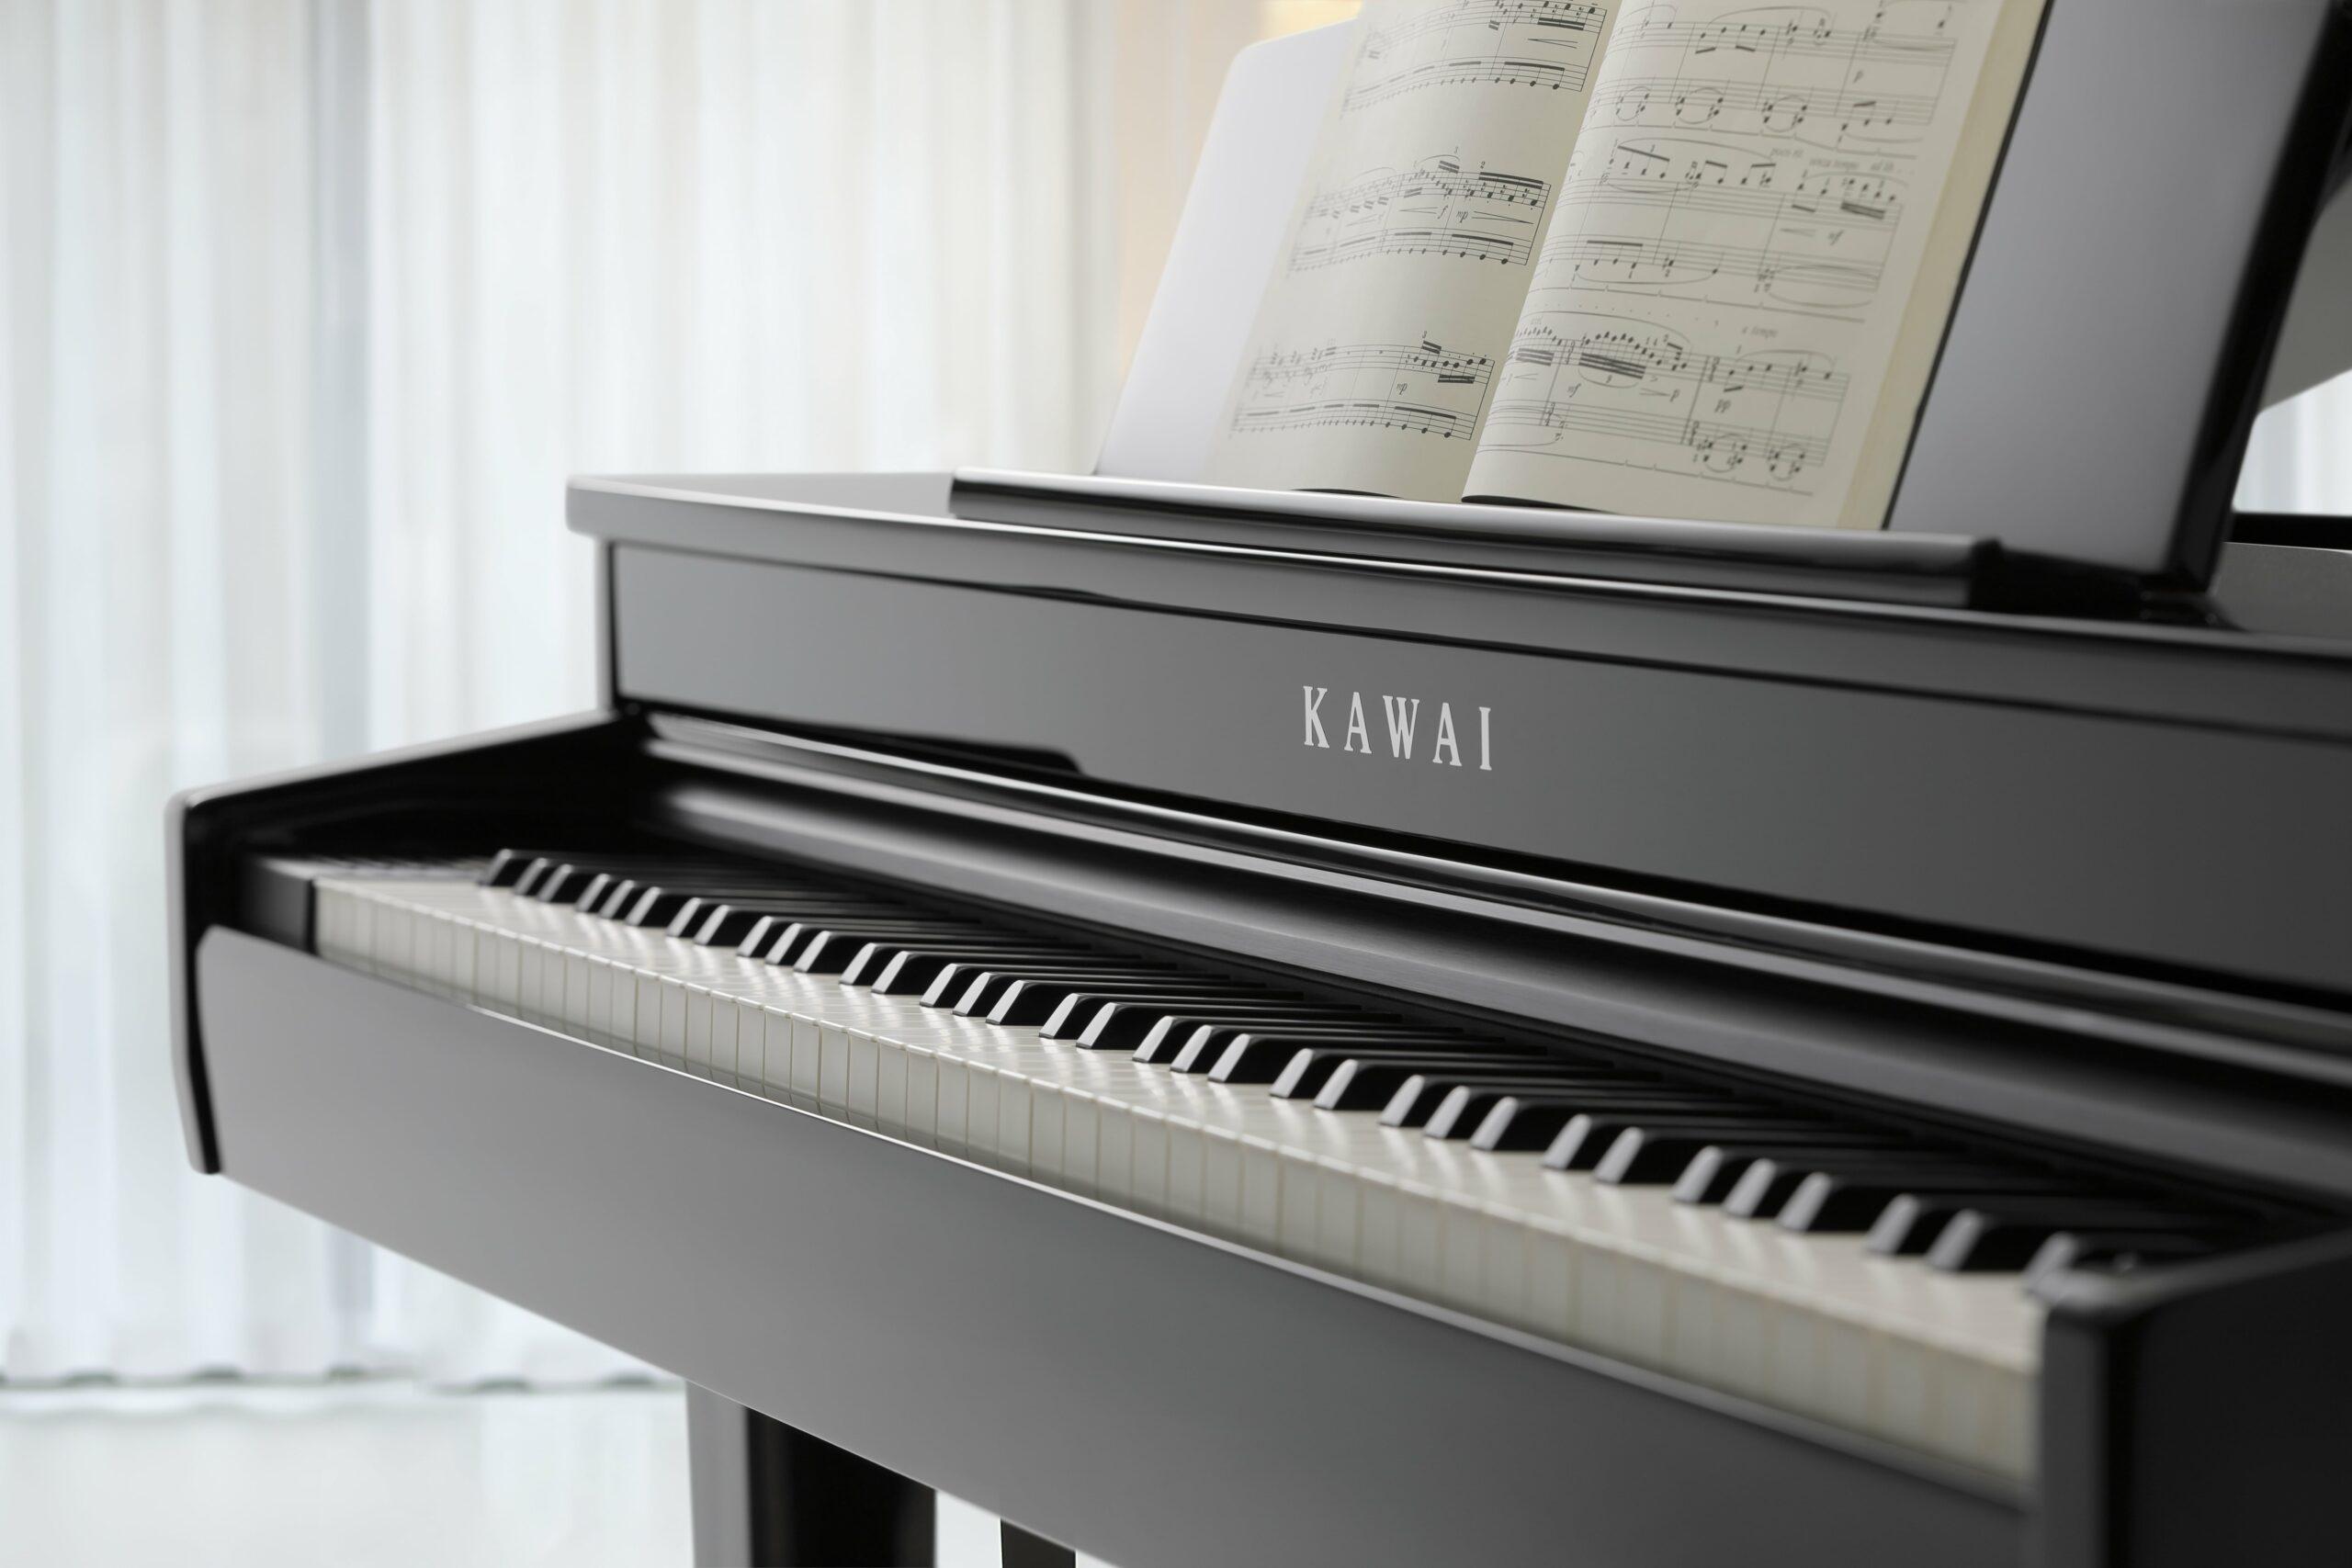 Kawai DG30 Keyboard Light